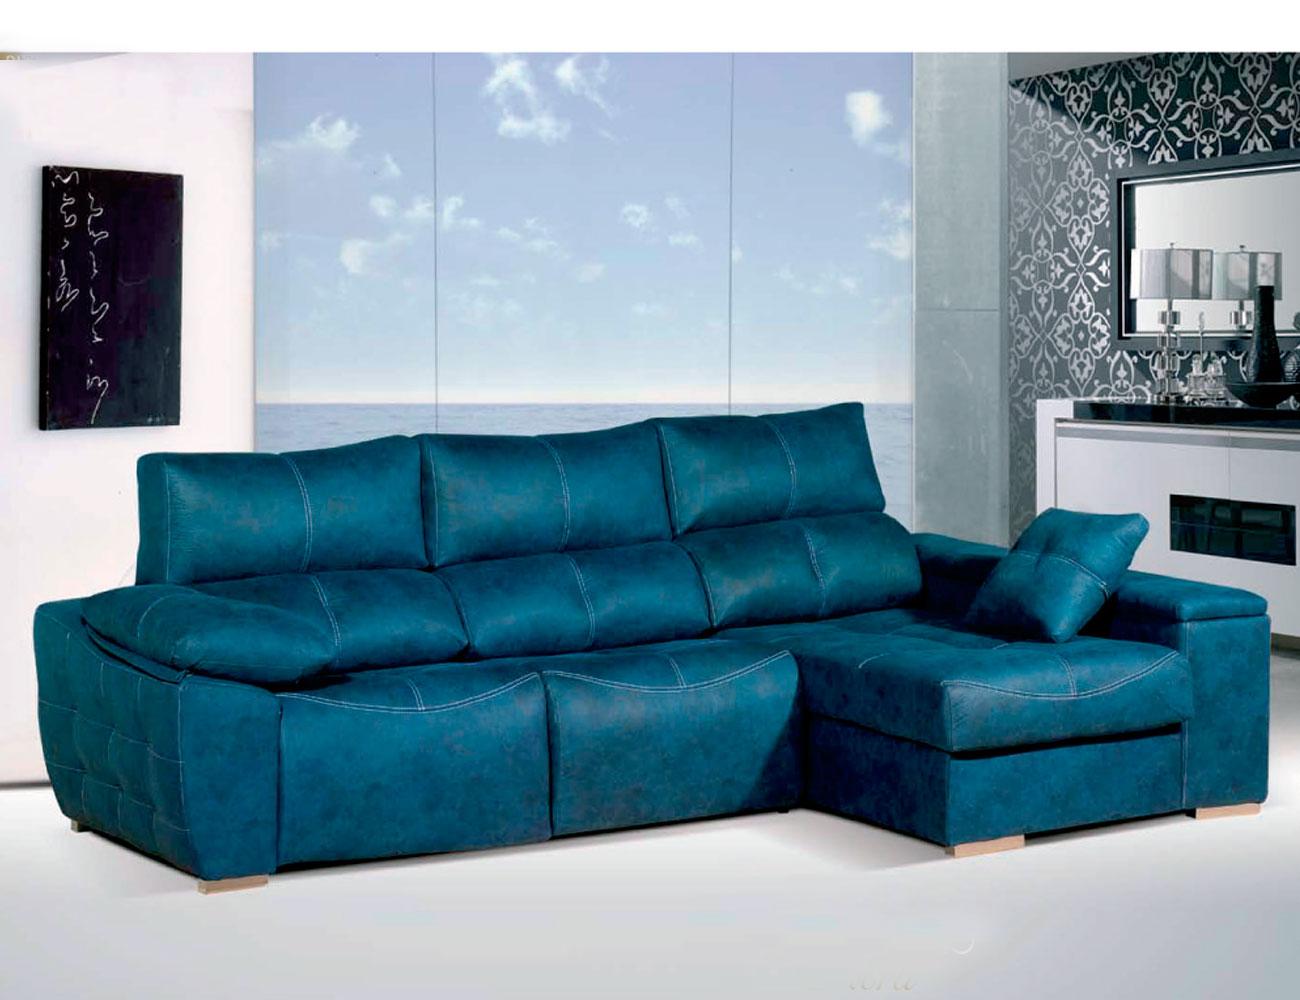 Sofa chaiselongue relax 2 motores anti manchas turquesa40